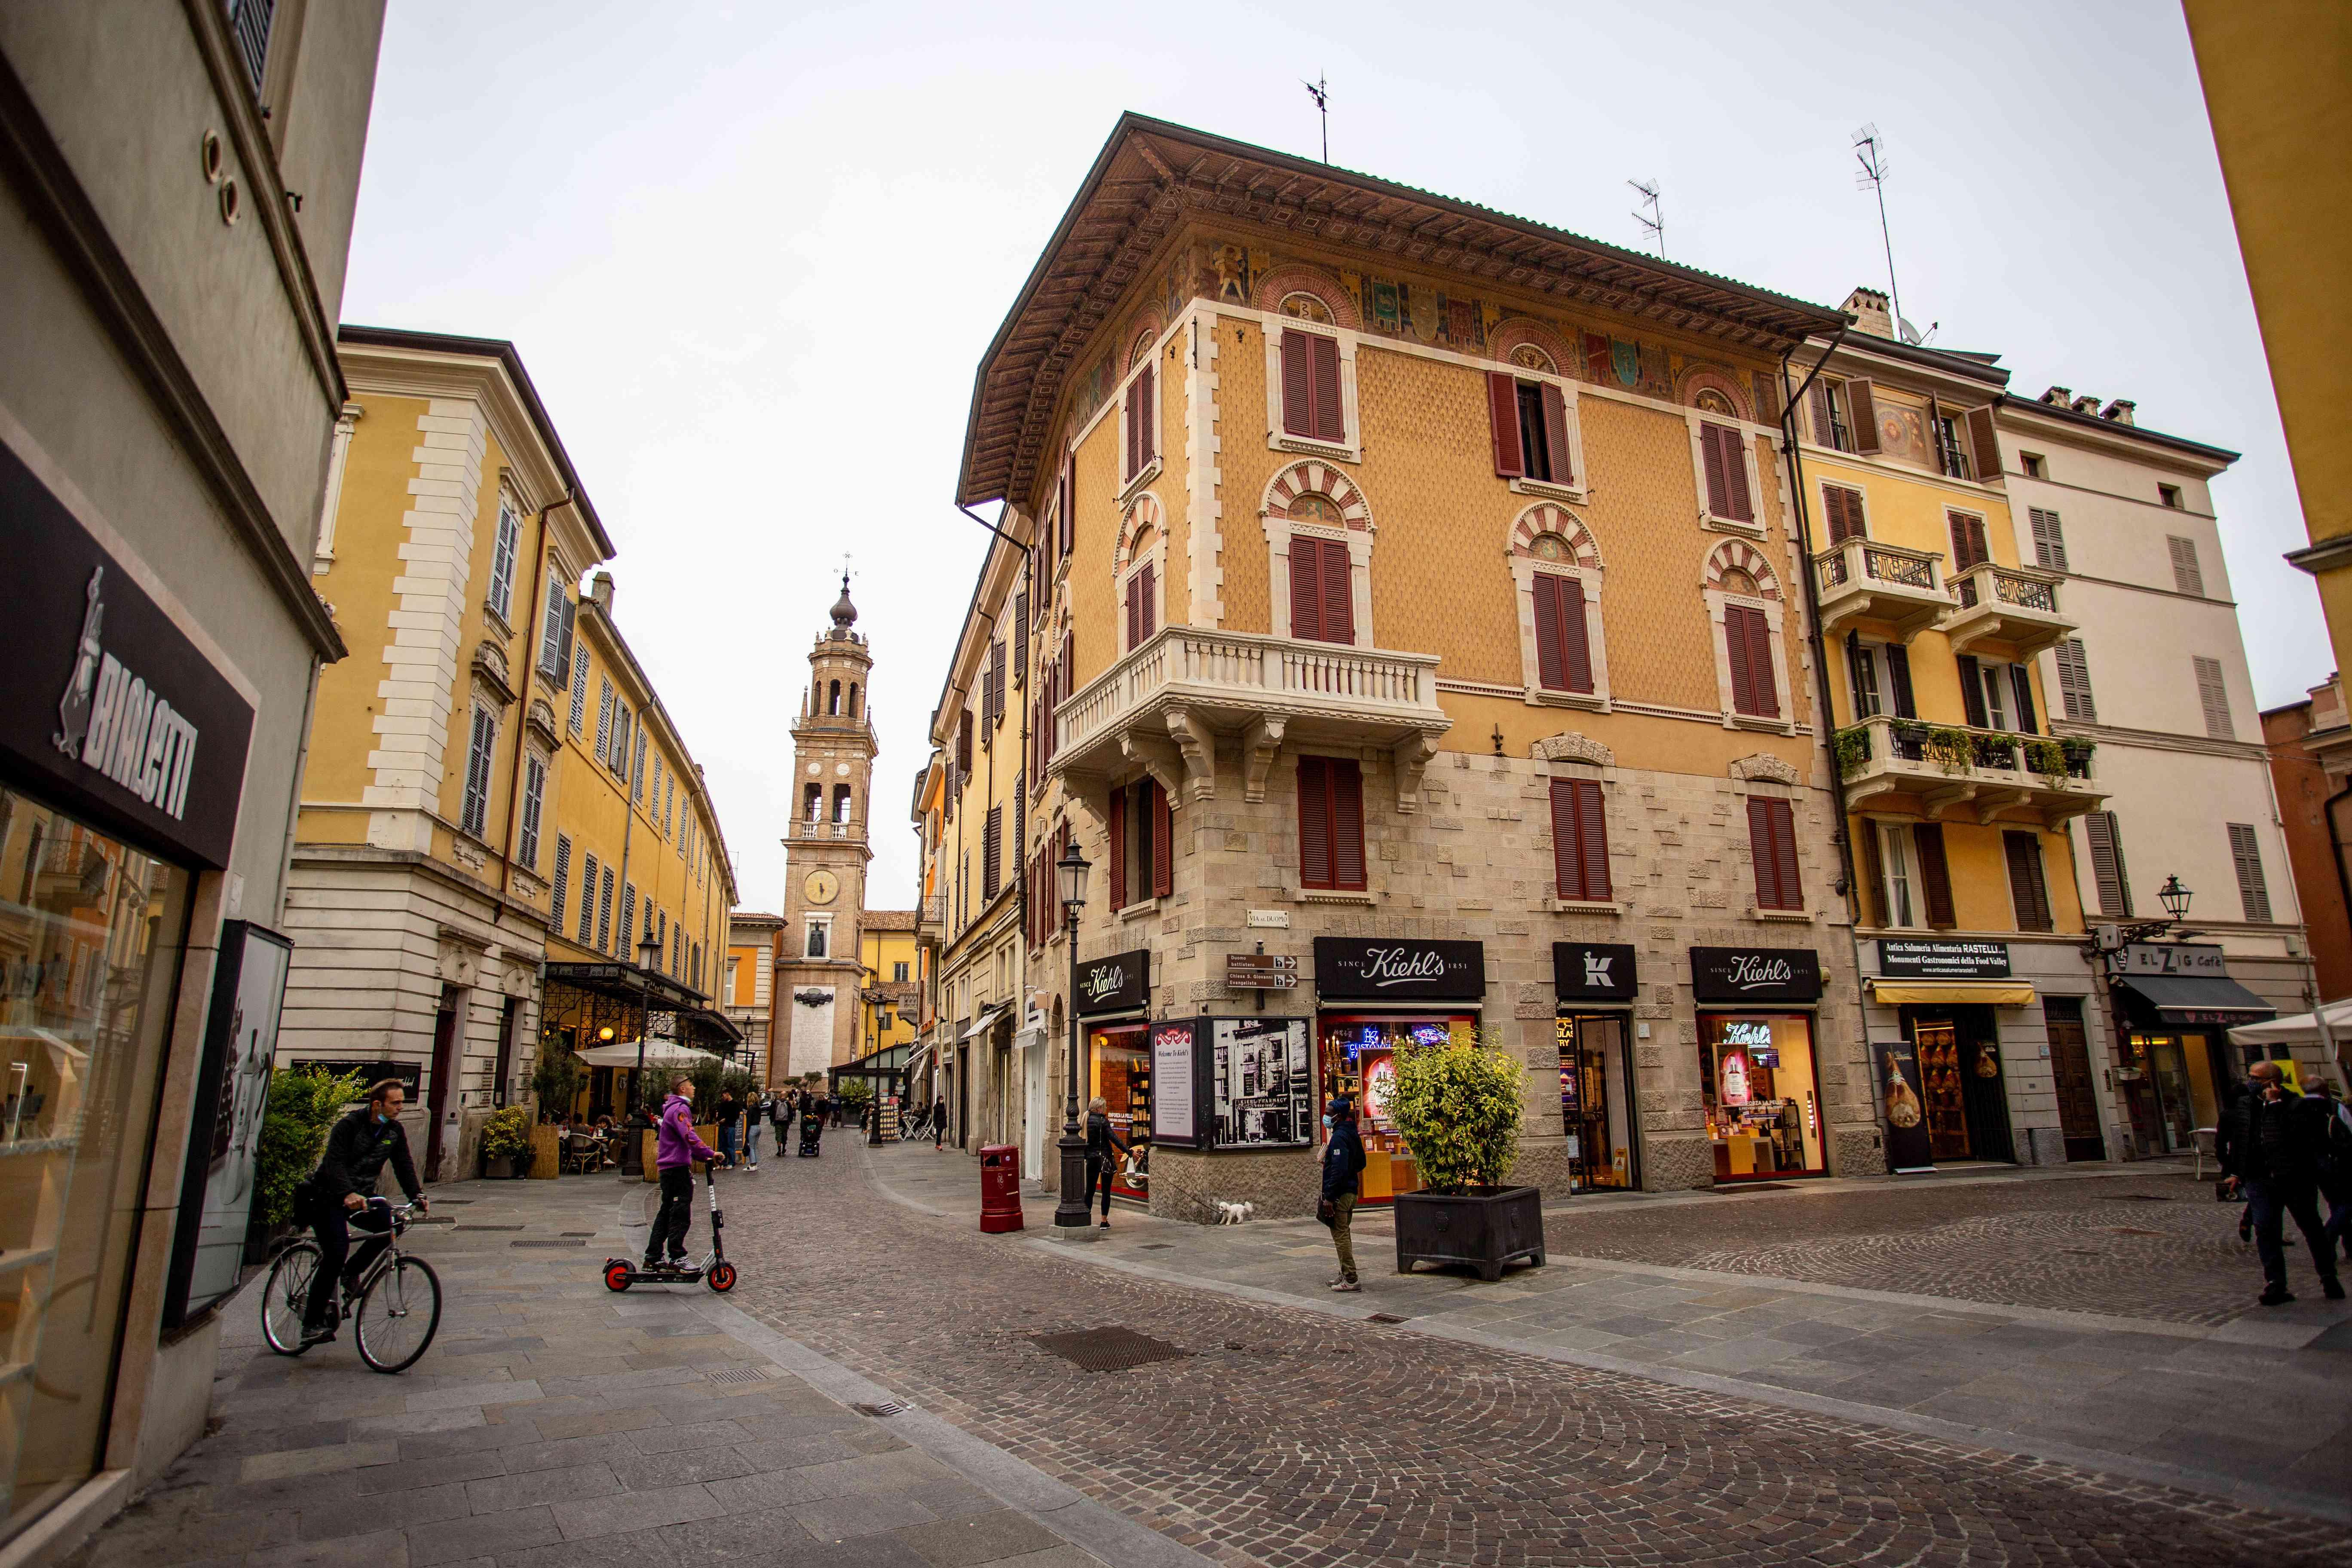 Parma, Italy